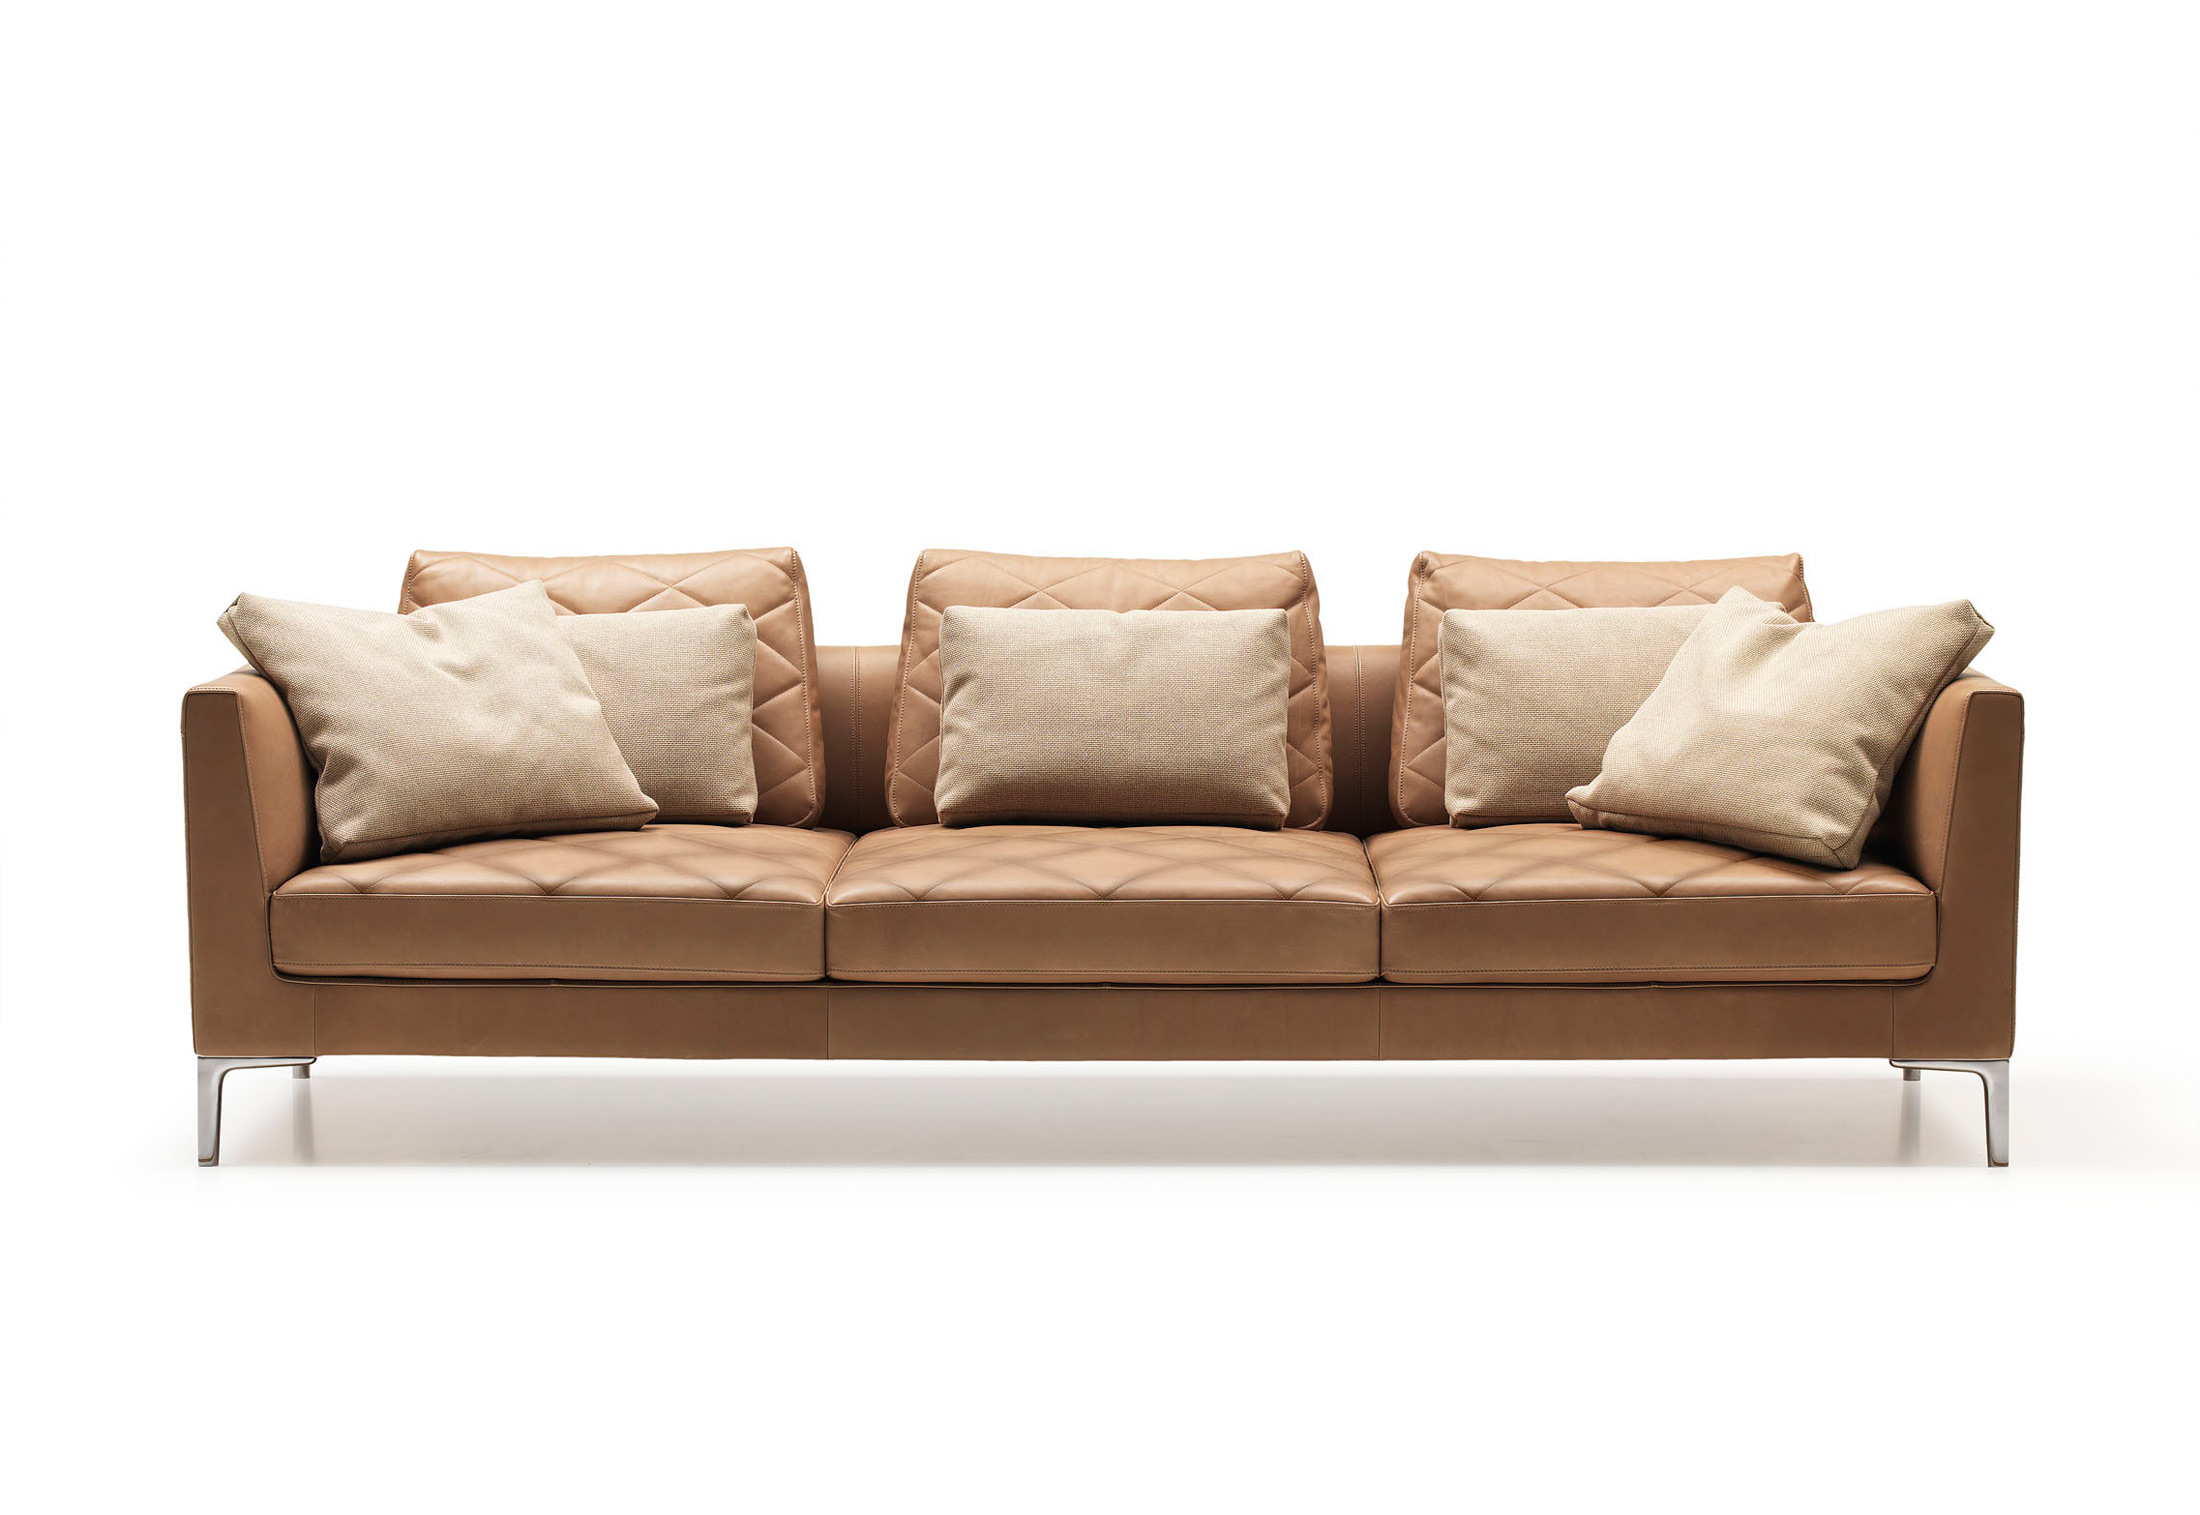 ds 48 sofa von de sede stylepark. Black Bedroom Furniture Sets. Home Design Ideas